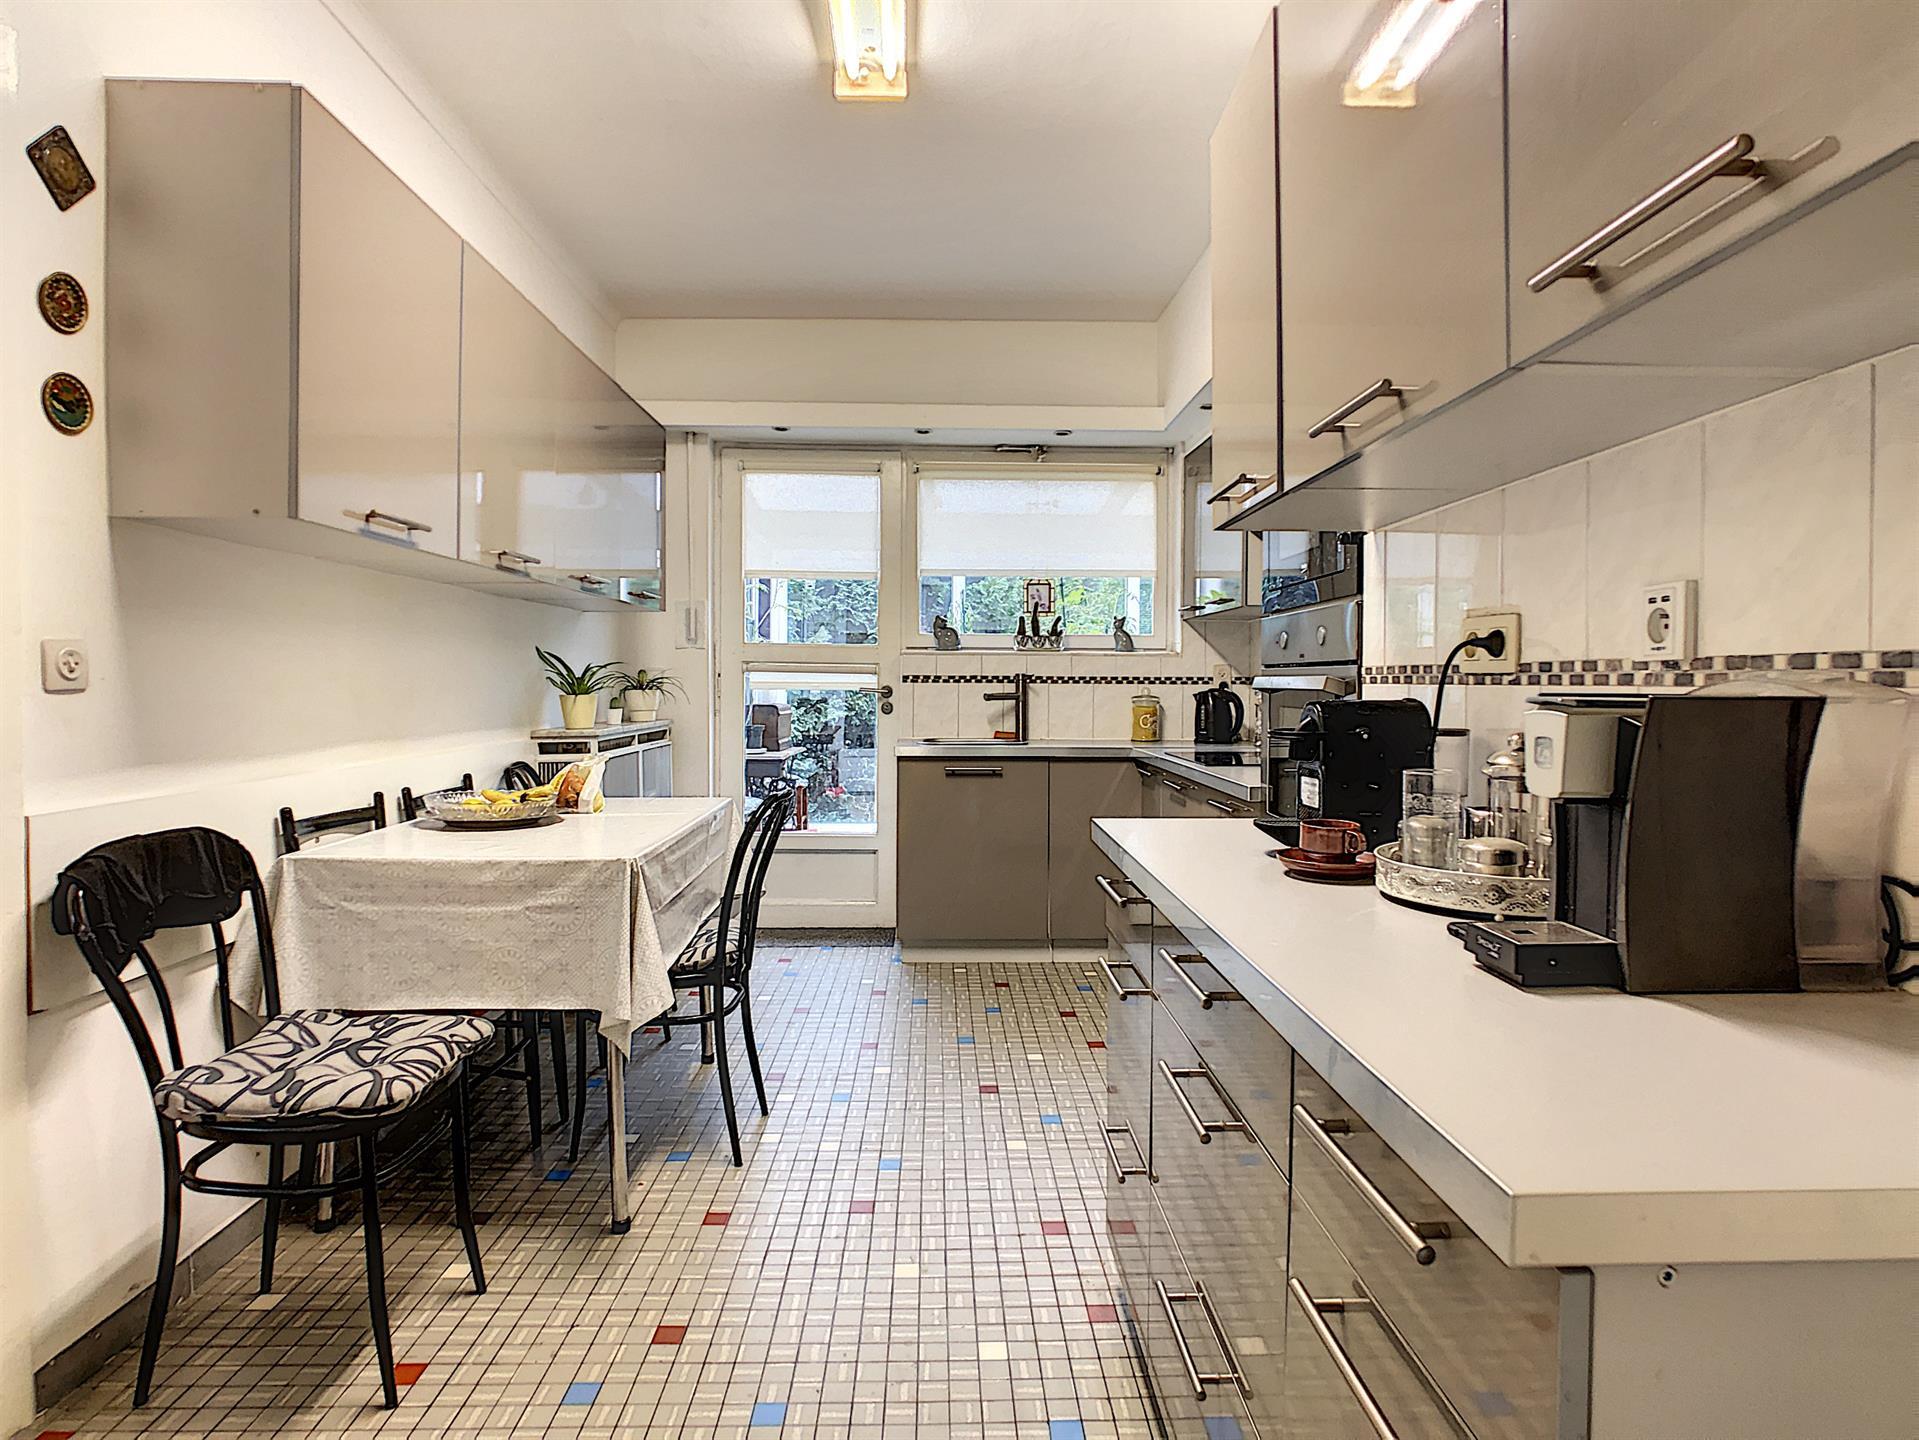 Villa - Dilbeek - #4087883-7